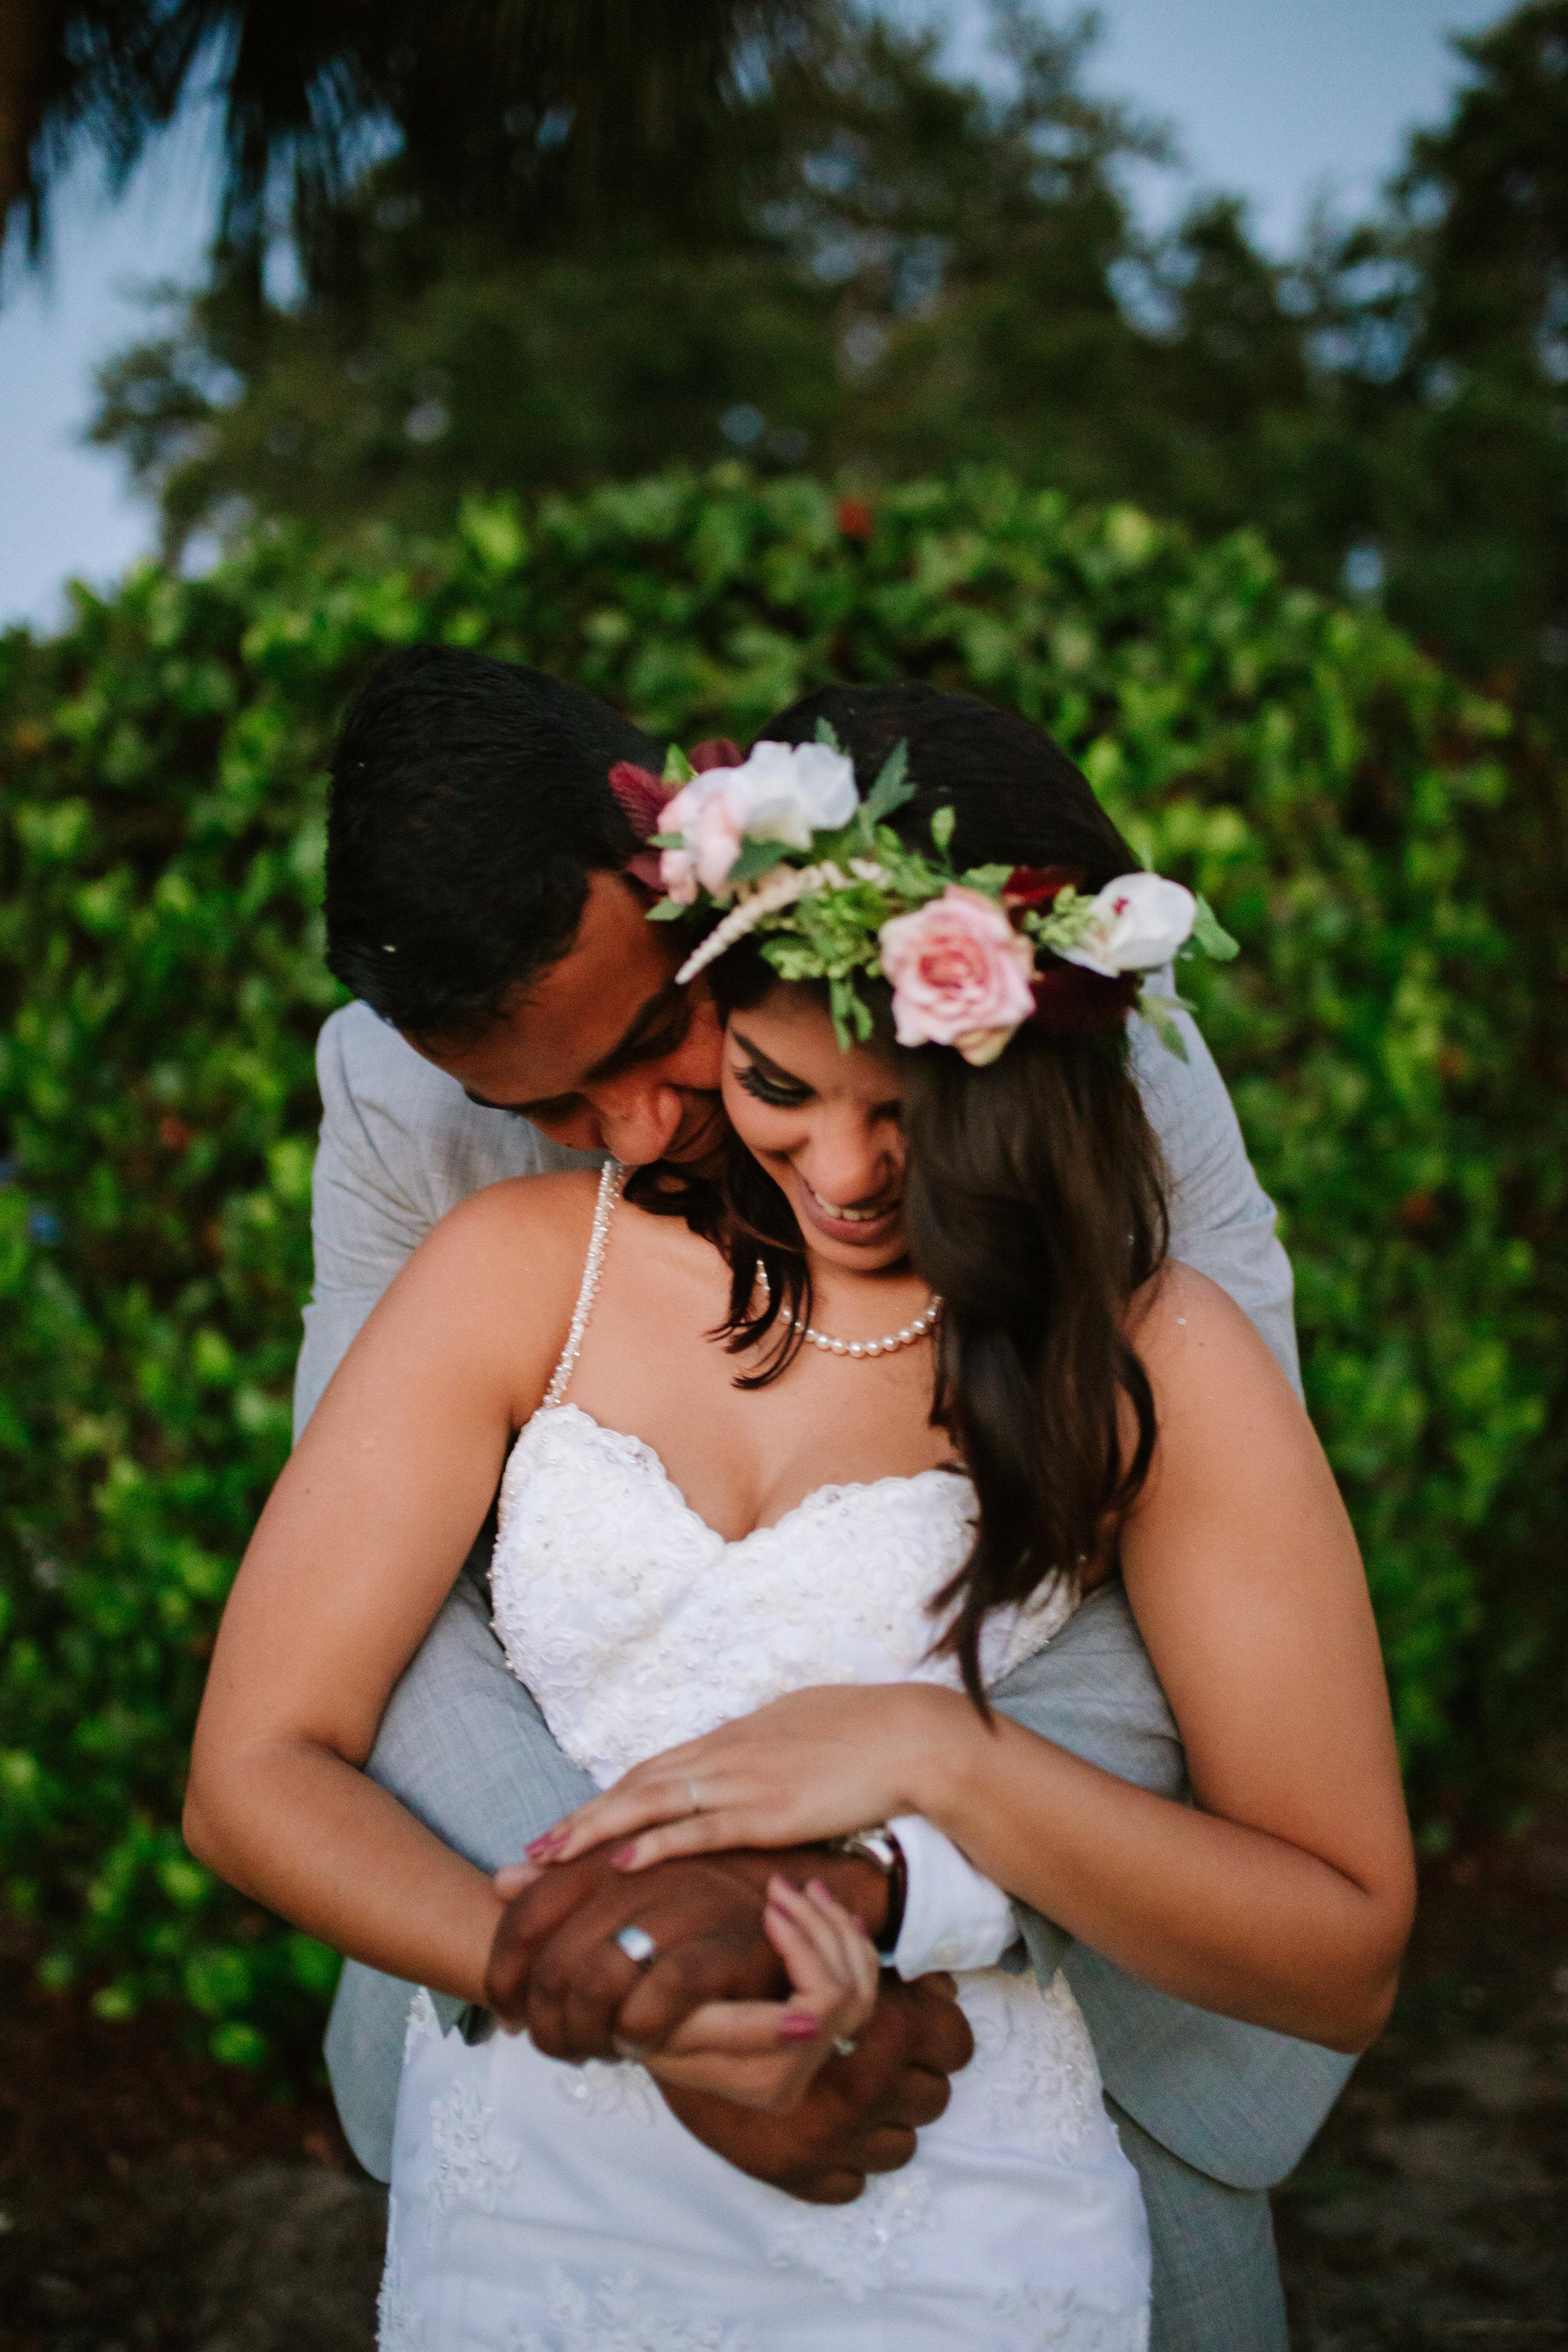 2017.05.23 Barbara and Mauricio Sales Port St Lucie Wedding (520 of 772).jpg